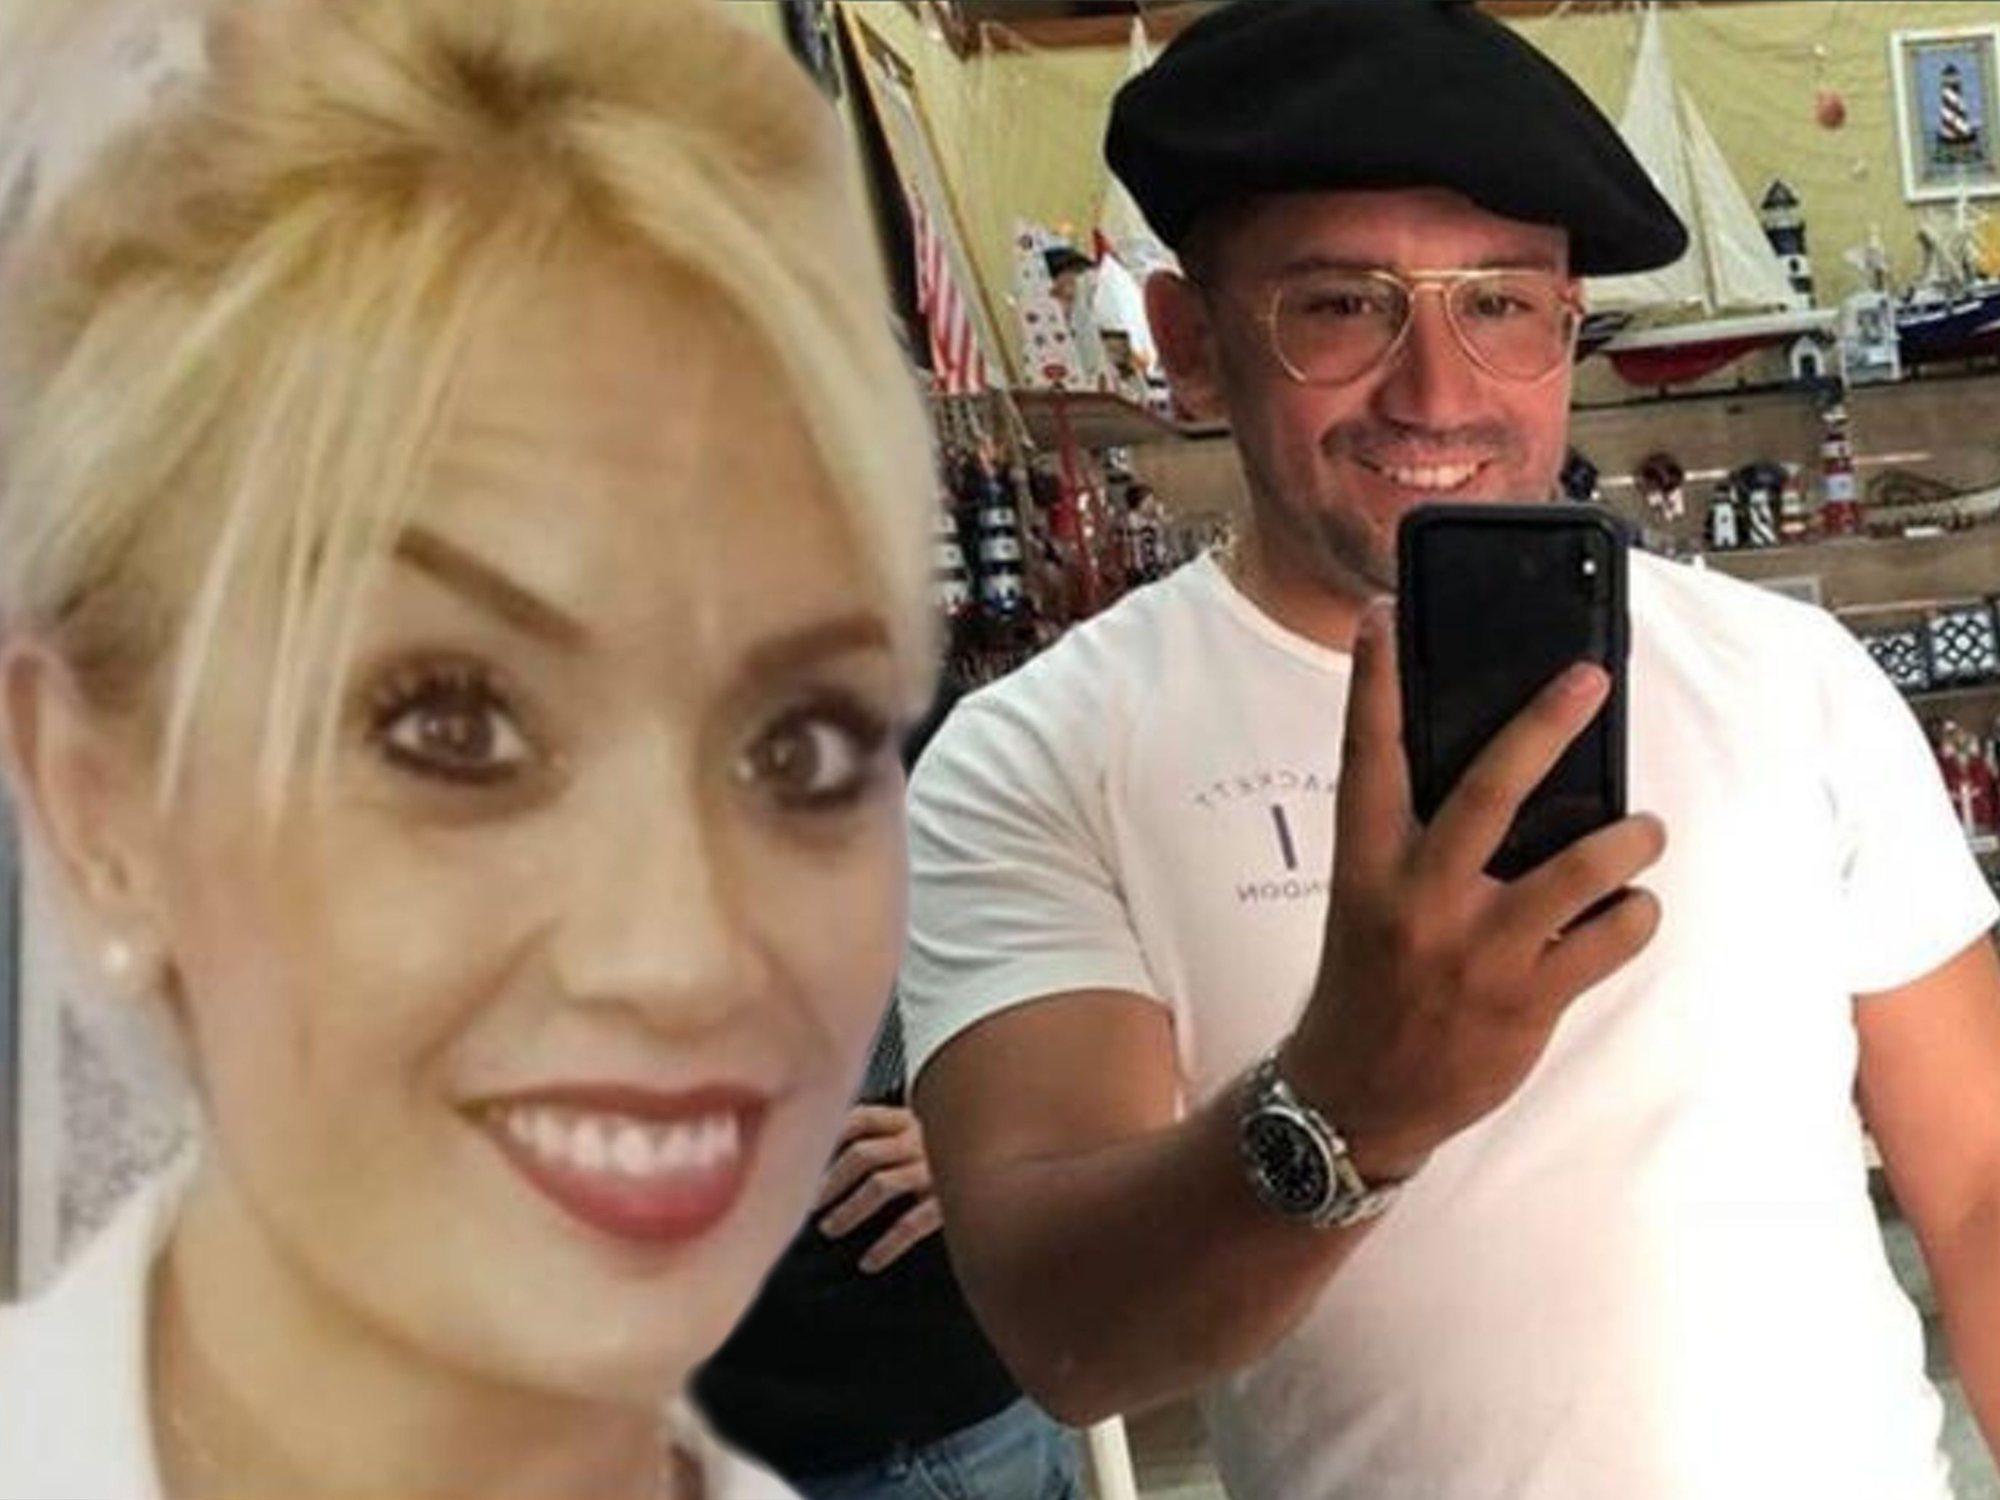 La Guardia Civil investiga si Jorge Palma, acusado de asesinar a Marta Calvo, es un asesino en serie